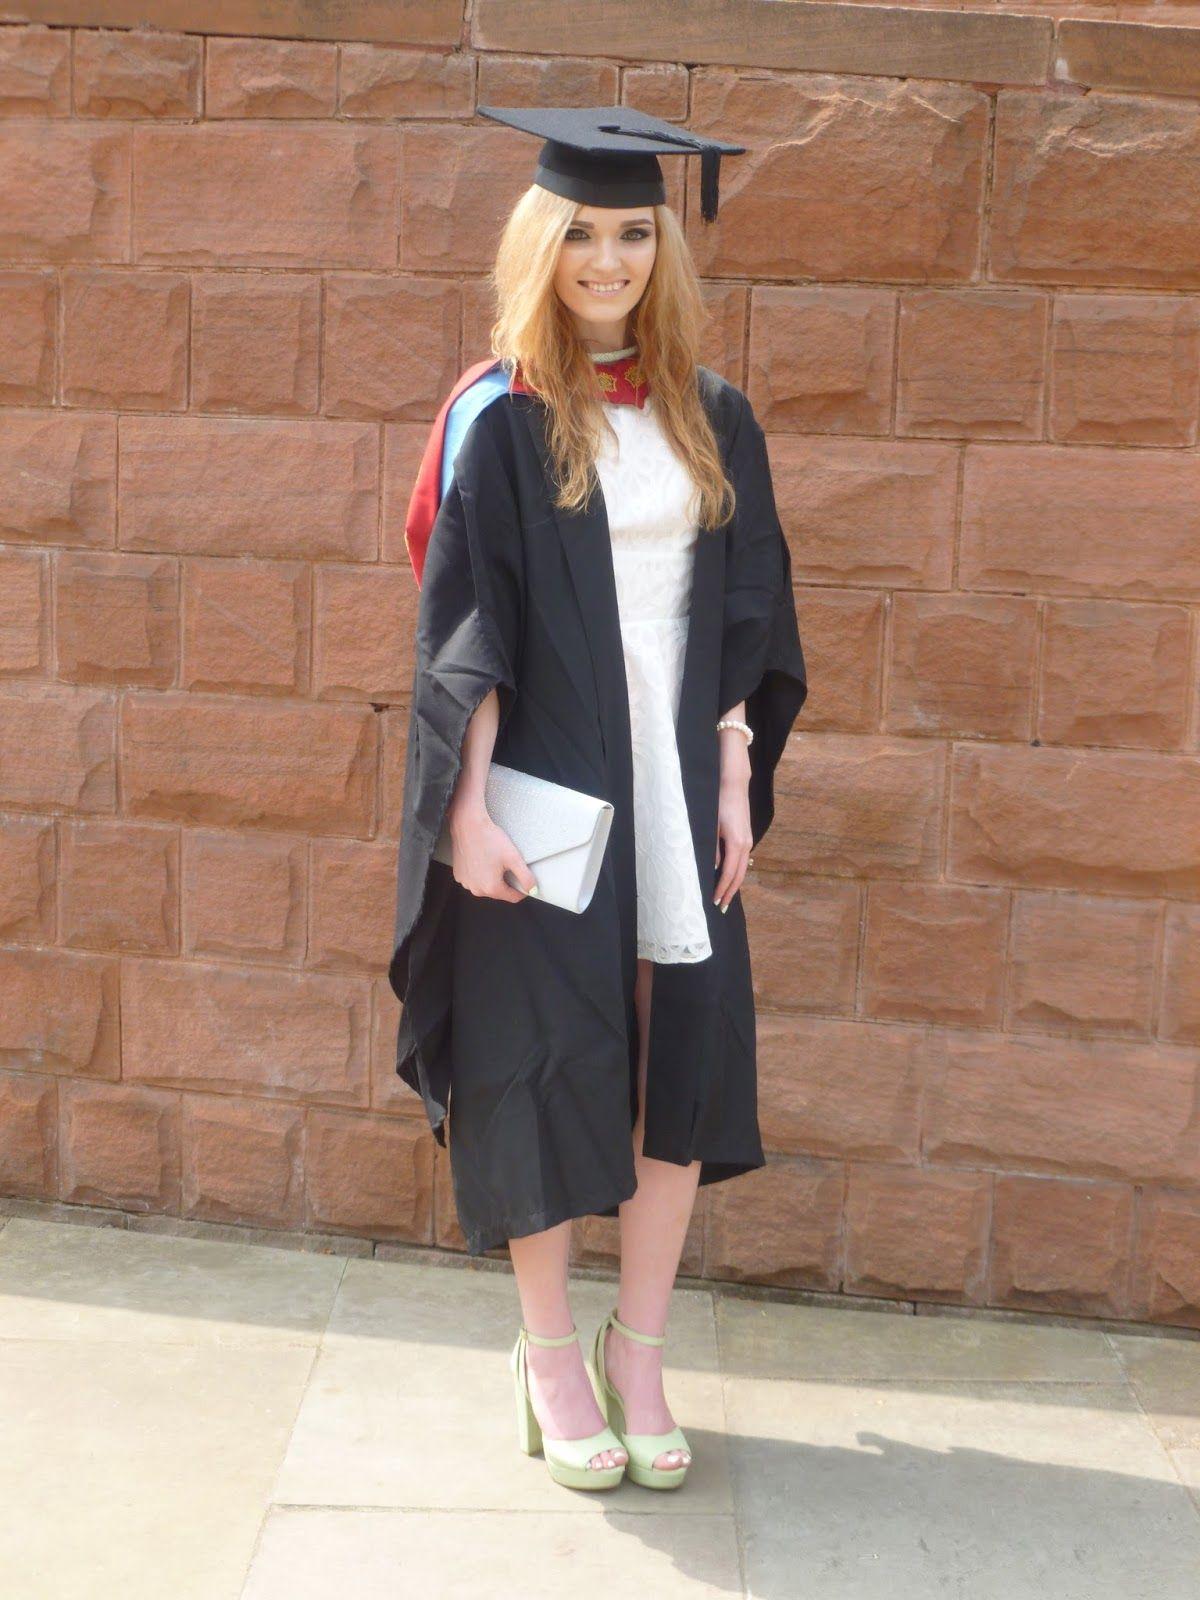 Girls High School Graduation Outfit